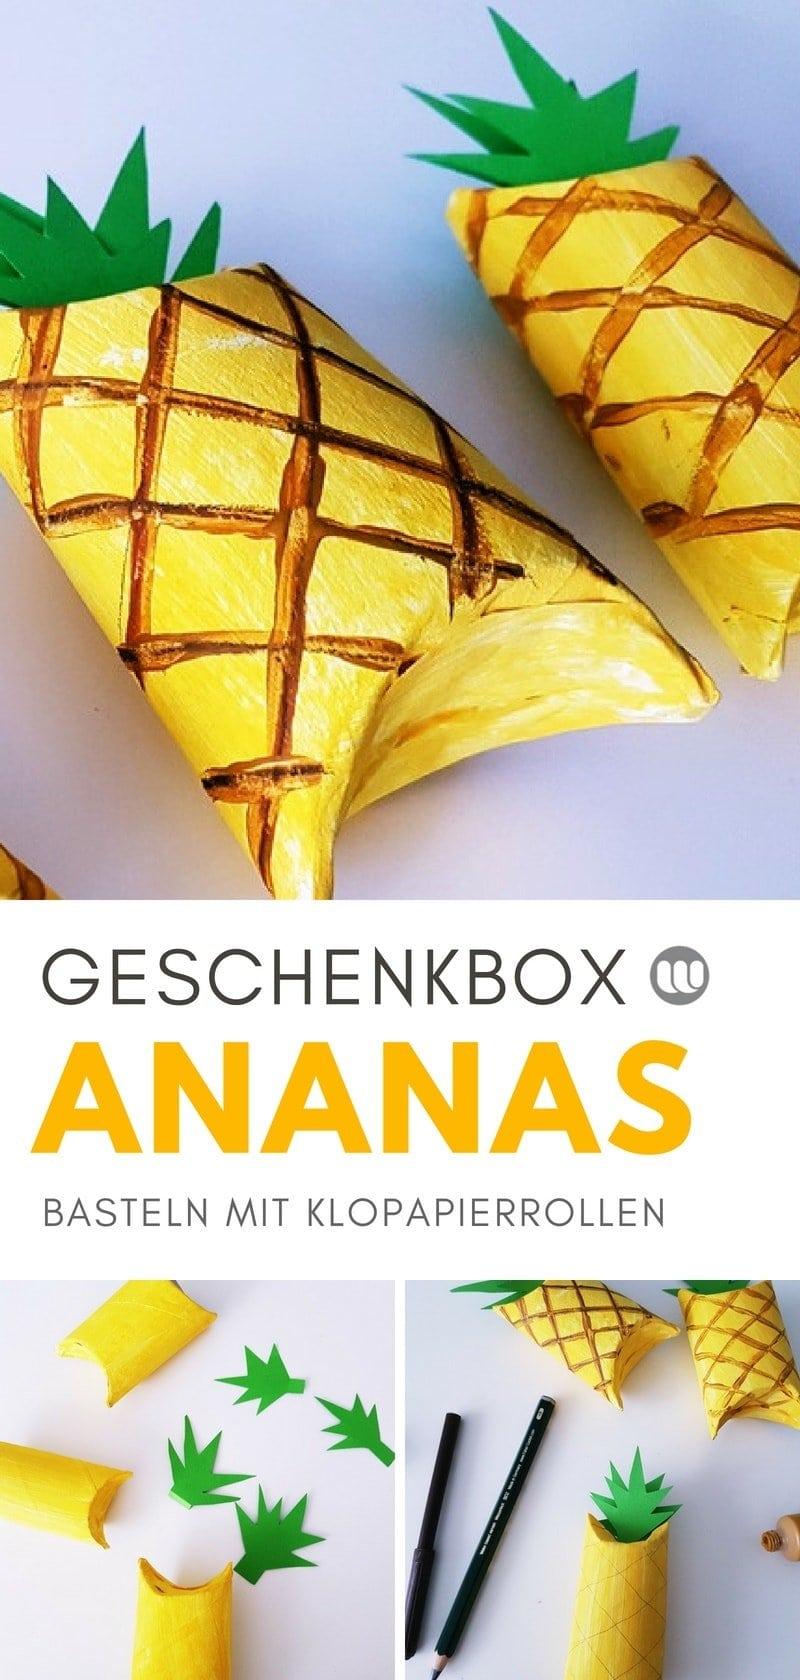 Geschenkverpackung basteln #Klopapierrolle #Ananas #Geschenkverpackung #Frucht #Geschenkbox #Kindergarten #KITA #Schule #Kinder #Kunst #DIY